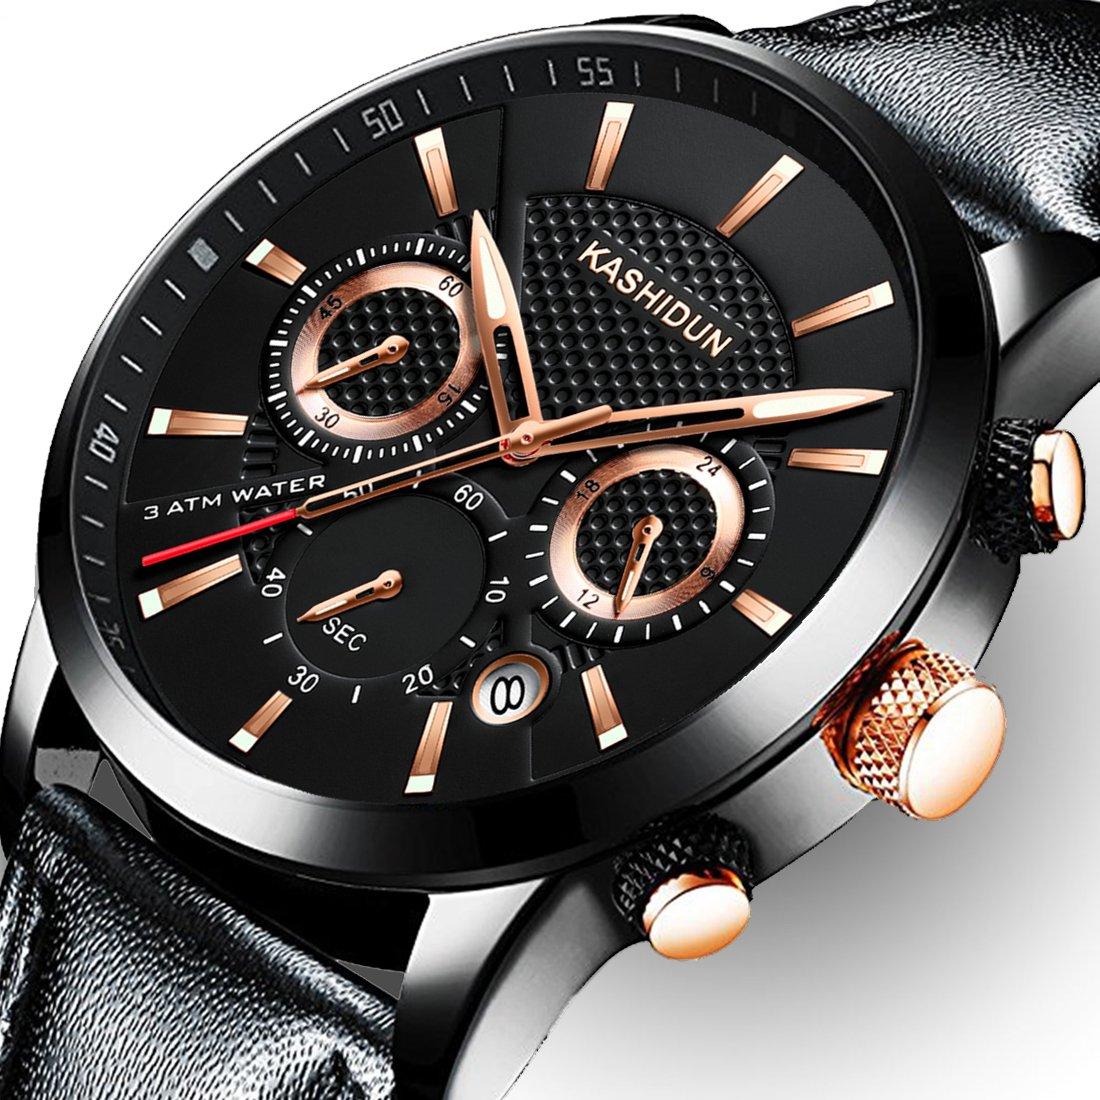 Men Leather Strap Watches Men's Chronograph Waterproof Sport Date Quartz Wrist Watches